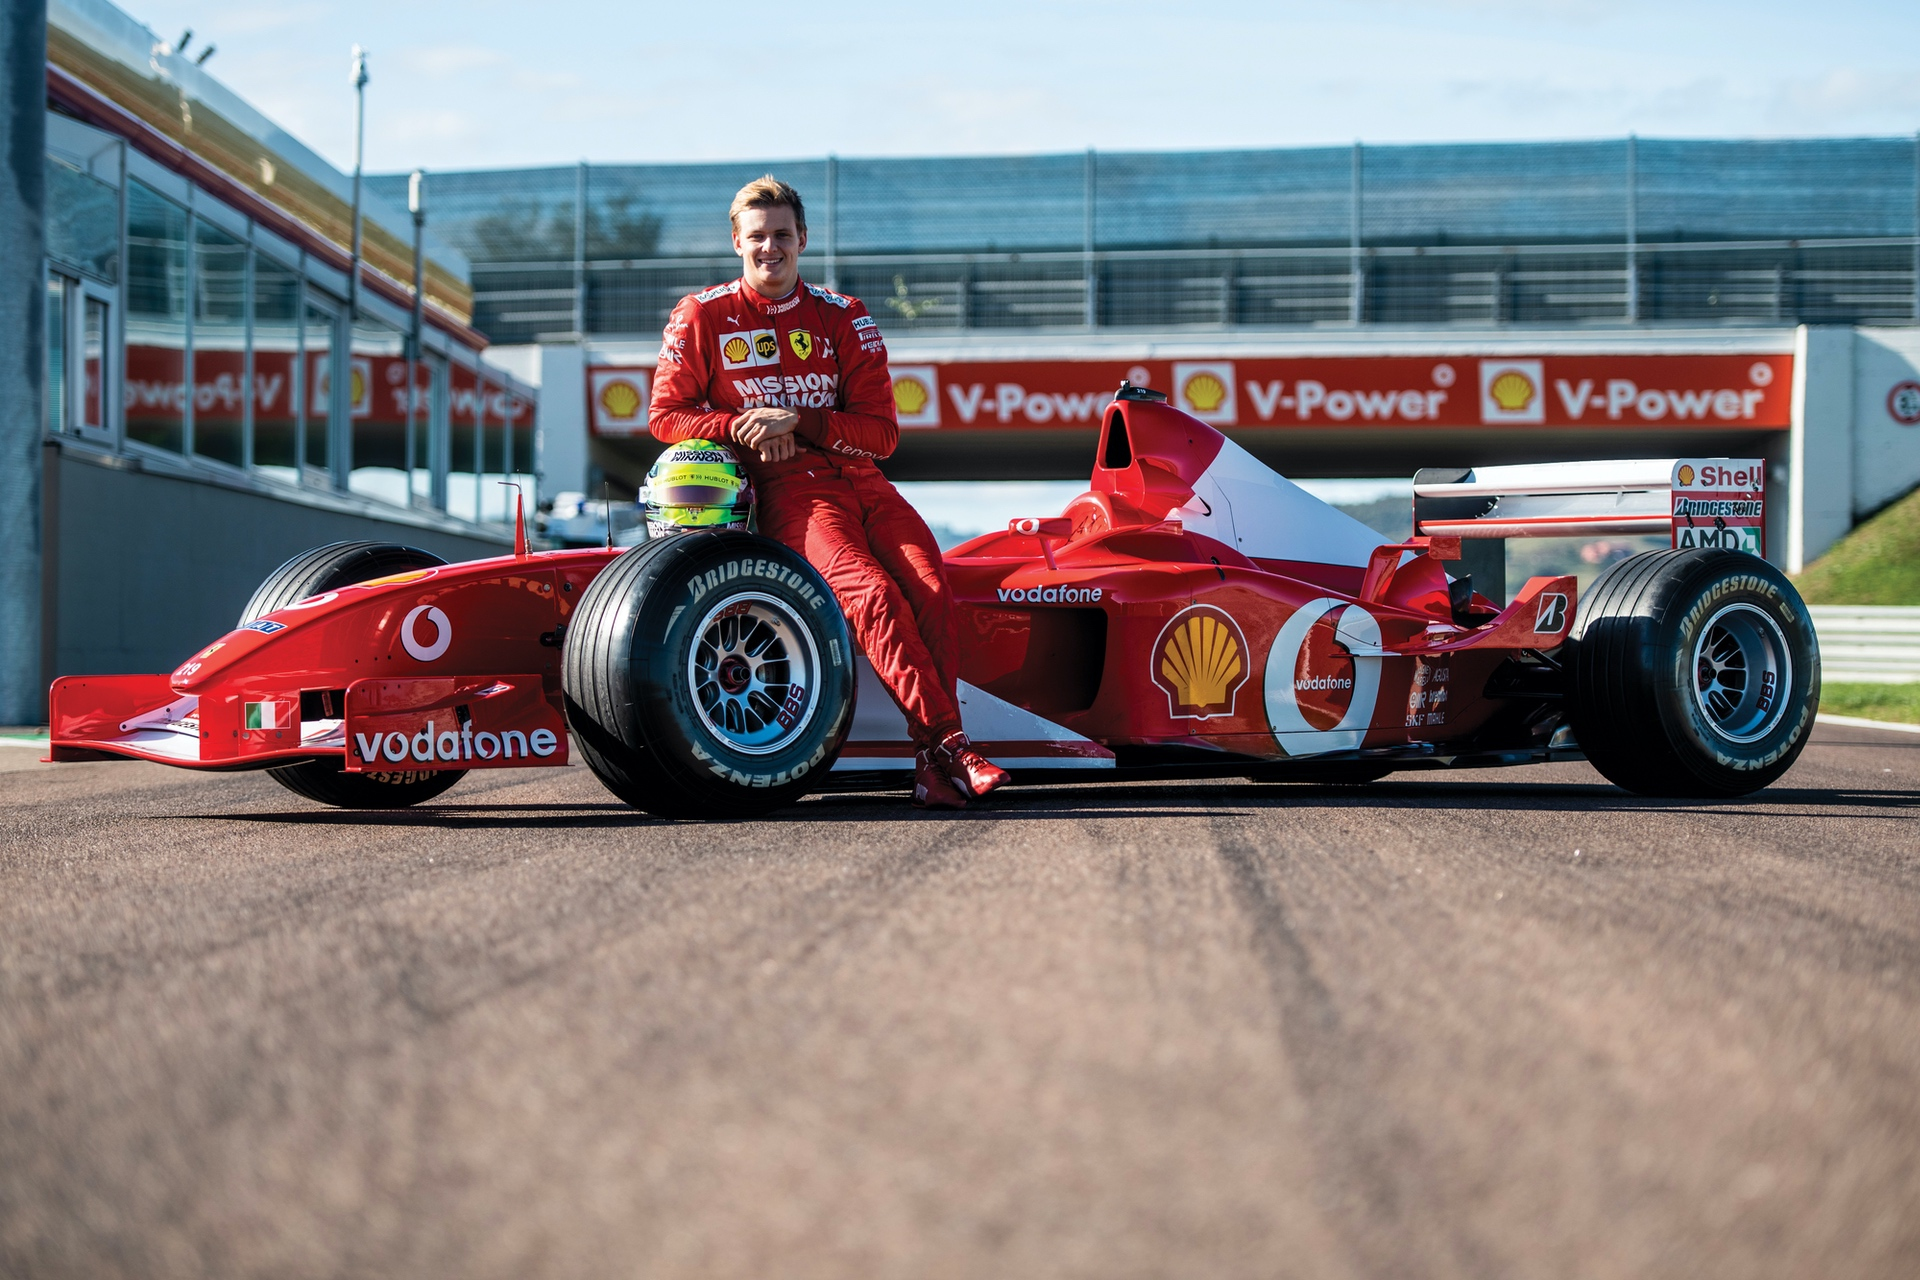 Mick_Schumacher_Ferrari_F2002_0006